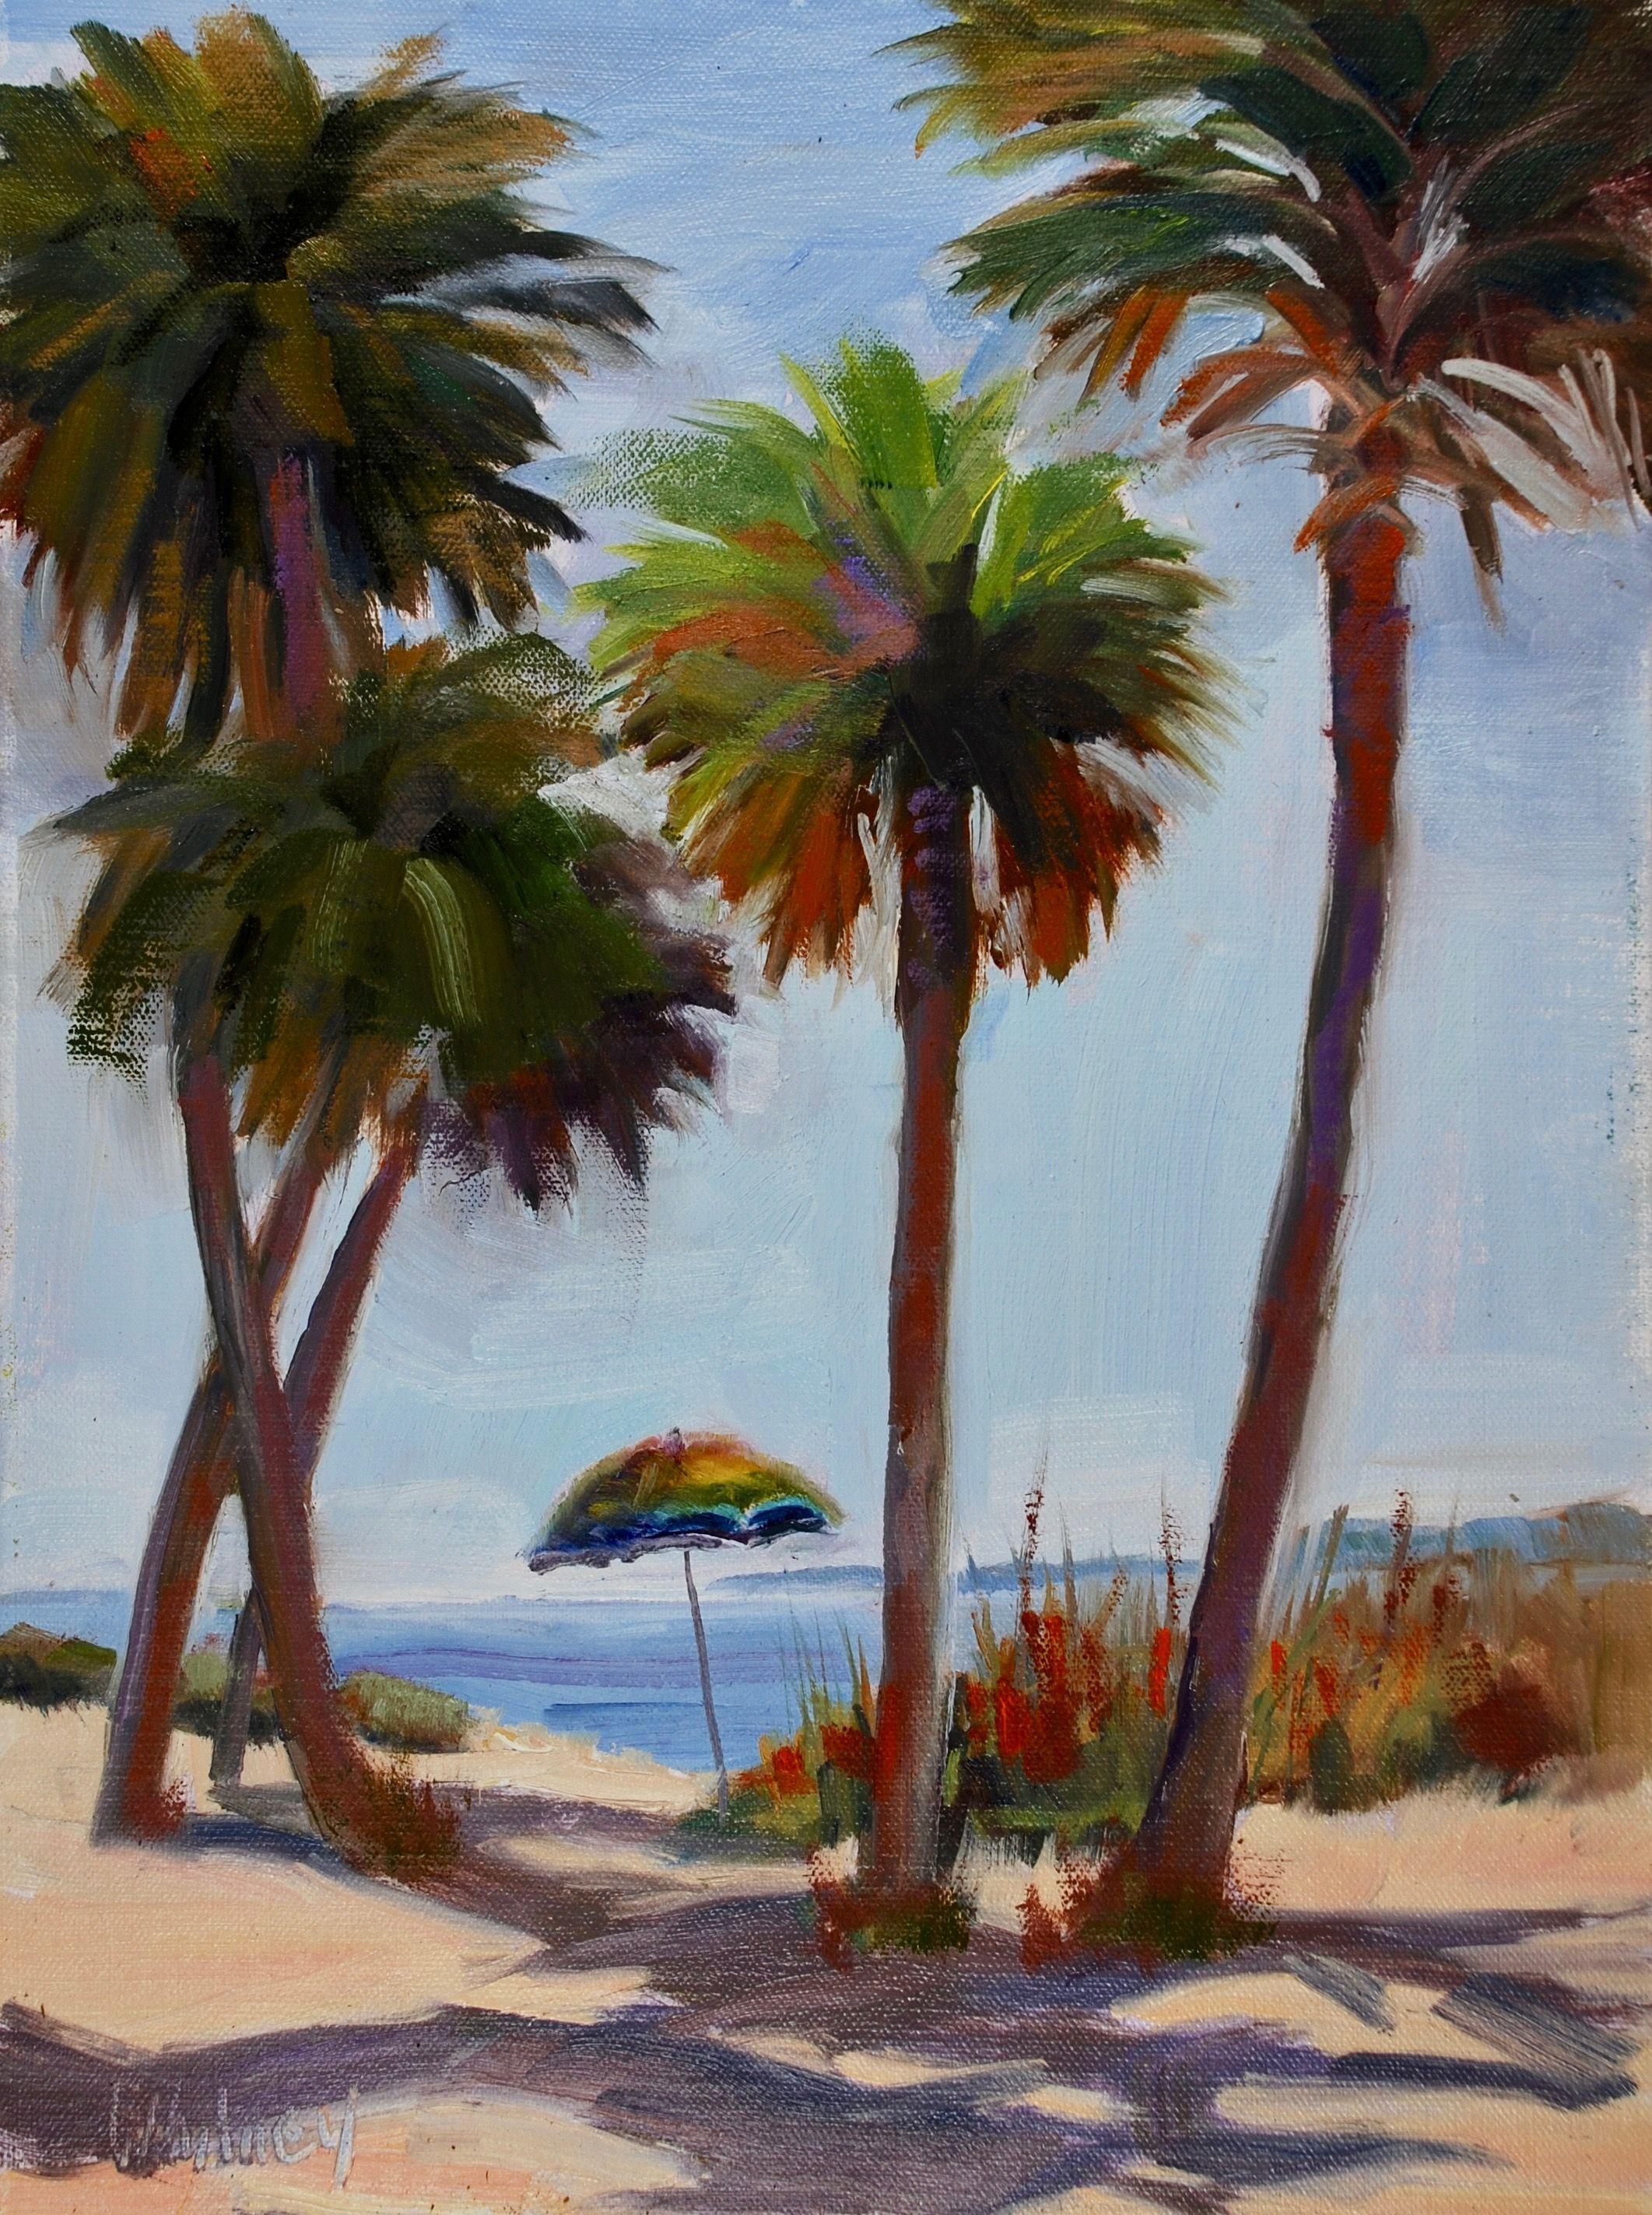 Florida Sunny Seashore Landscape With Beach Umbrella Palm Trees